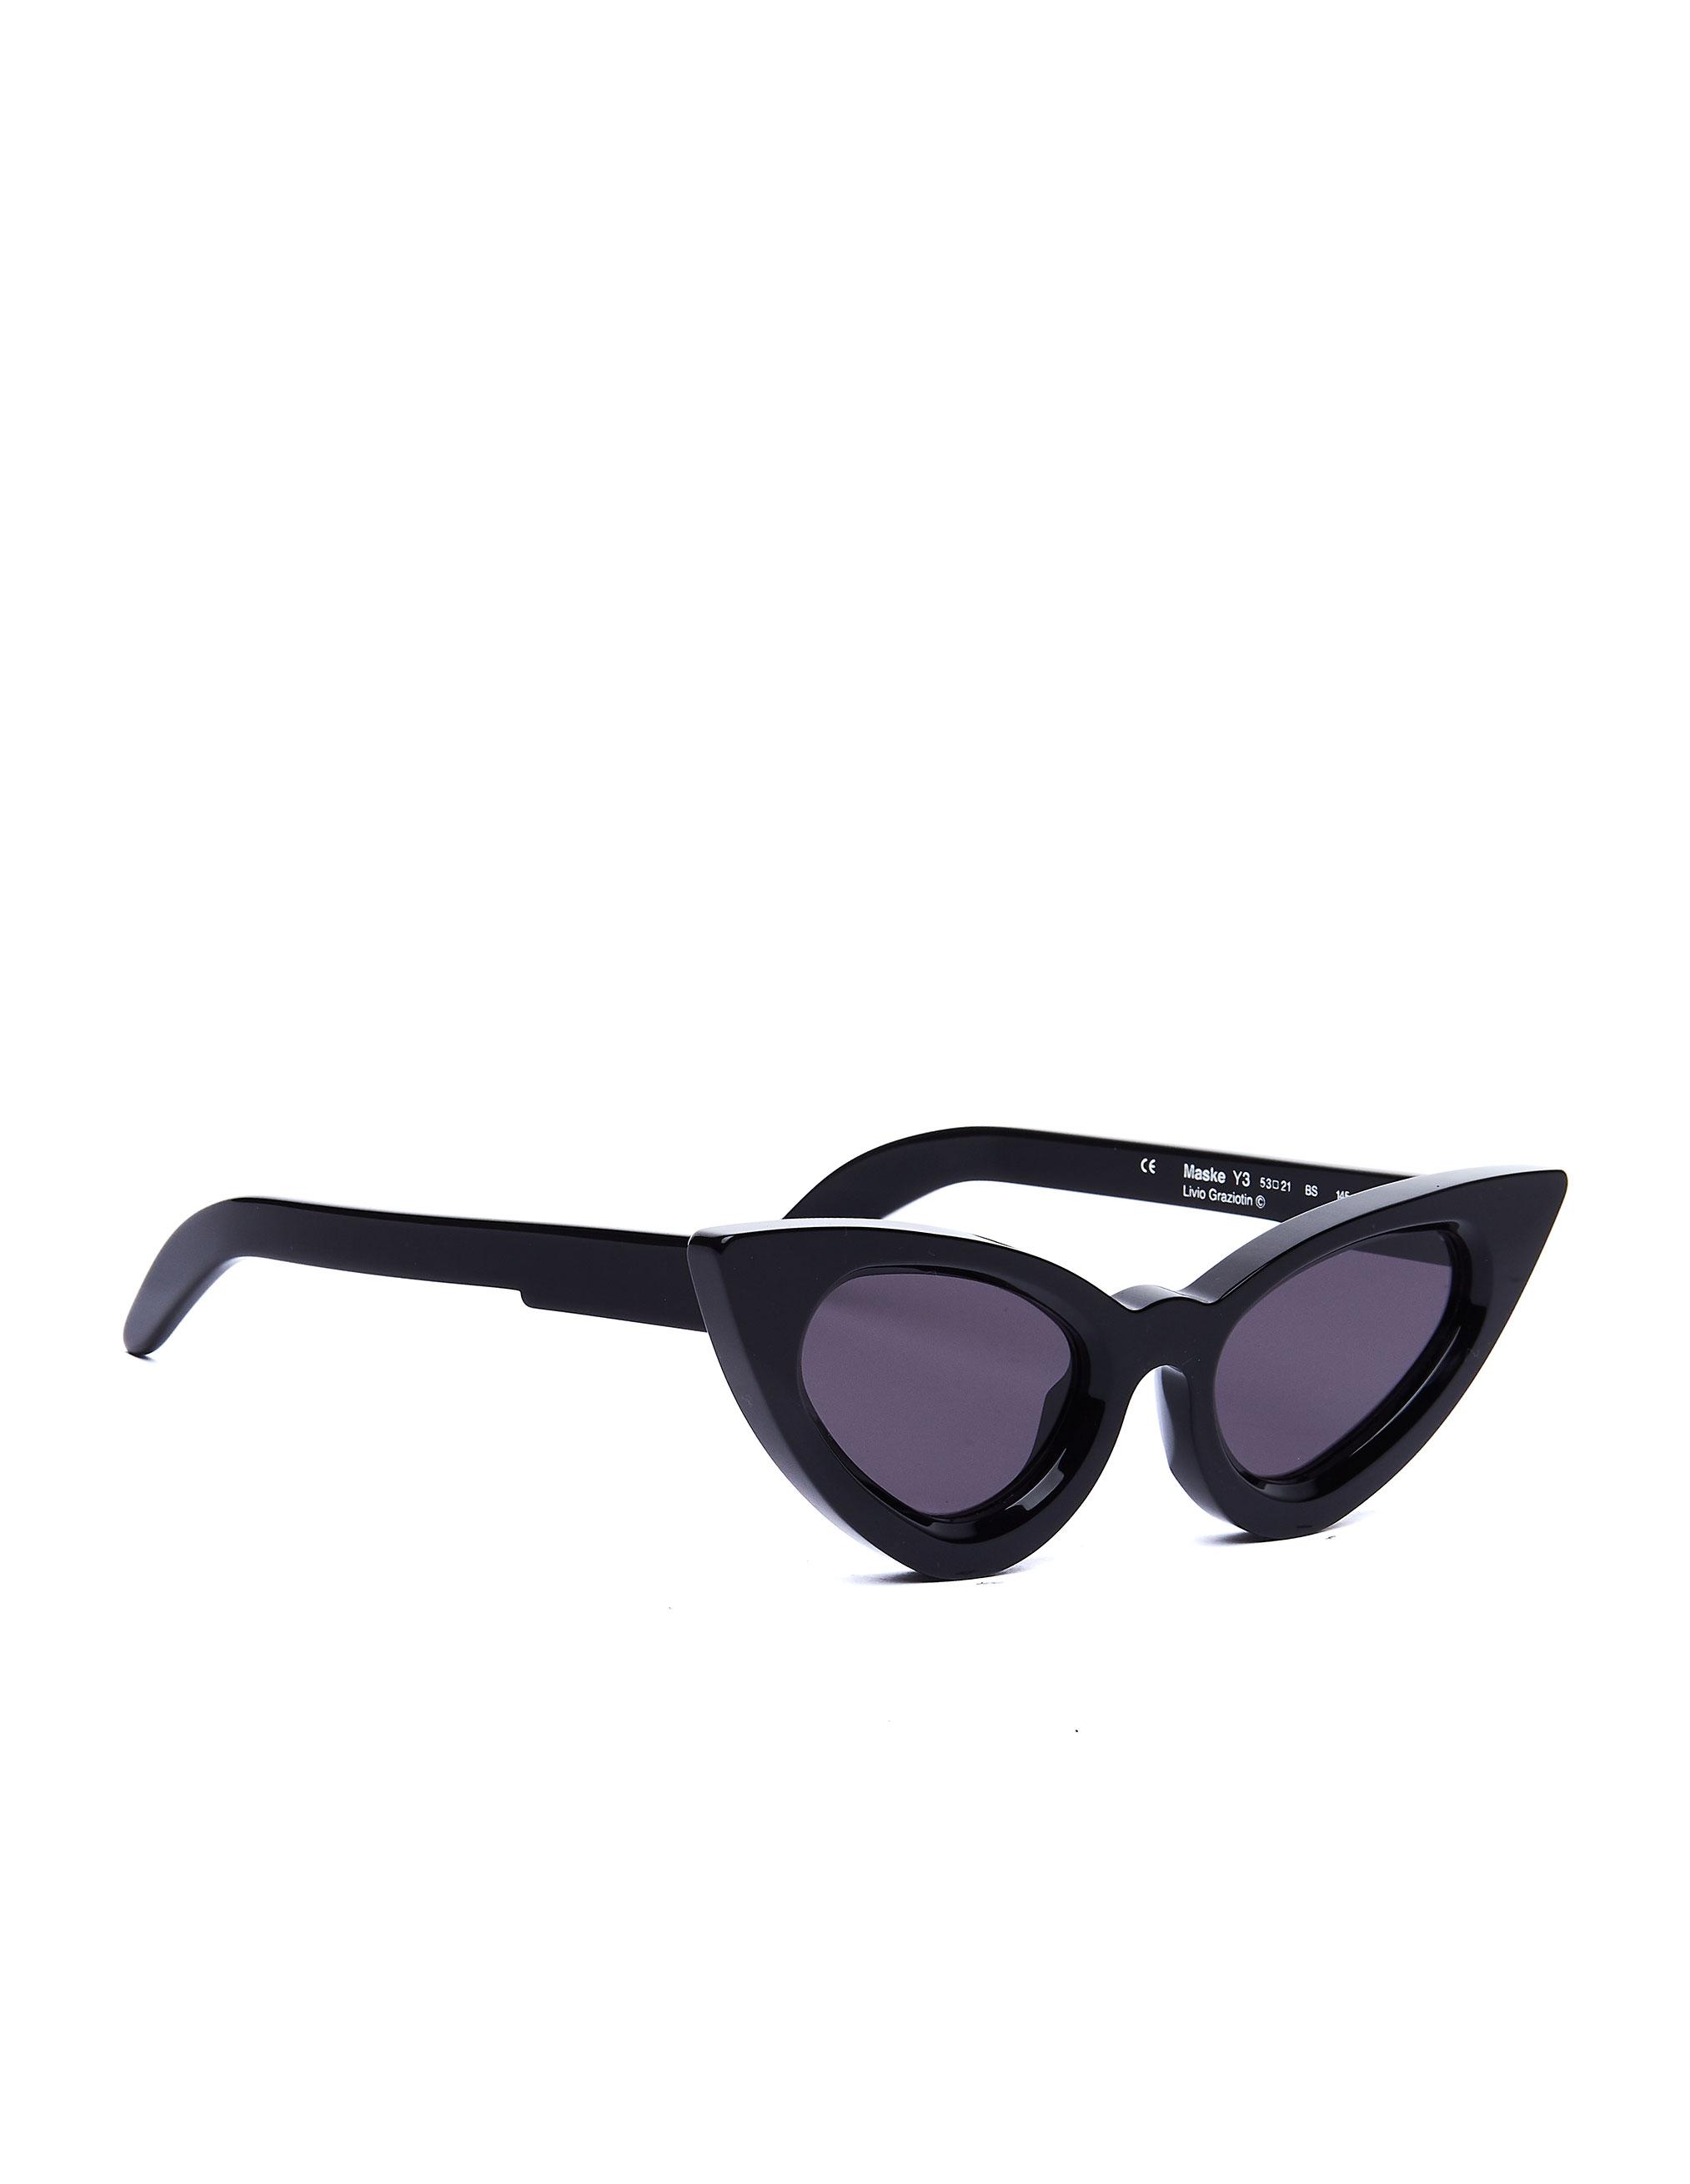 21a05da10c9f Kuboraum 'Mask Y3' Sunglasses In Black | ModeSens